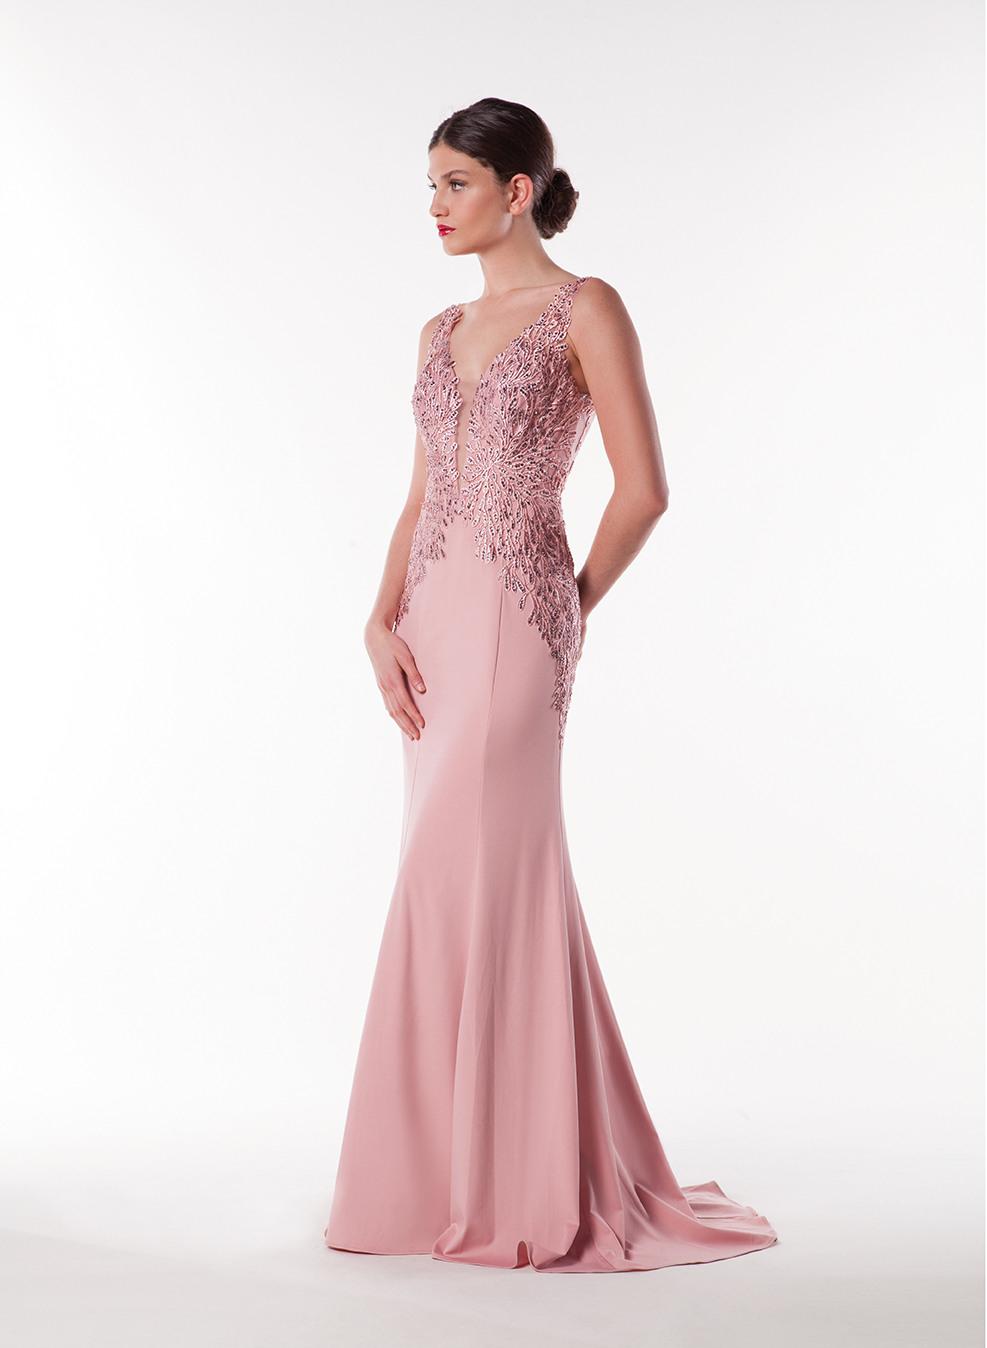 20 Coolste New Yorker Abendkleid Spezialgebiet13 Wunderbar New Yorker Abendkleid Stylish